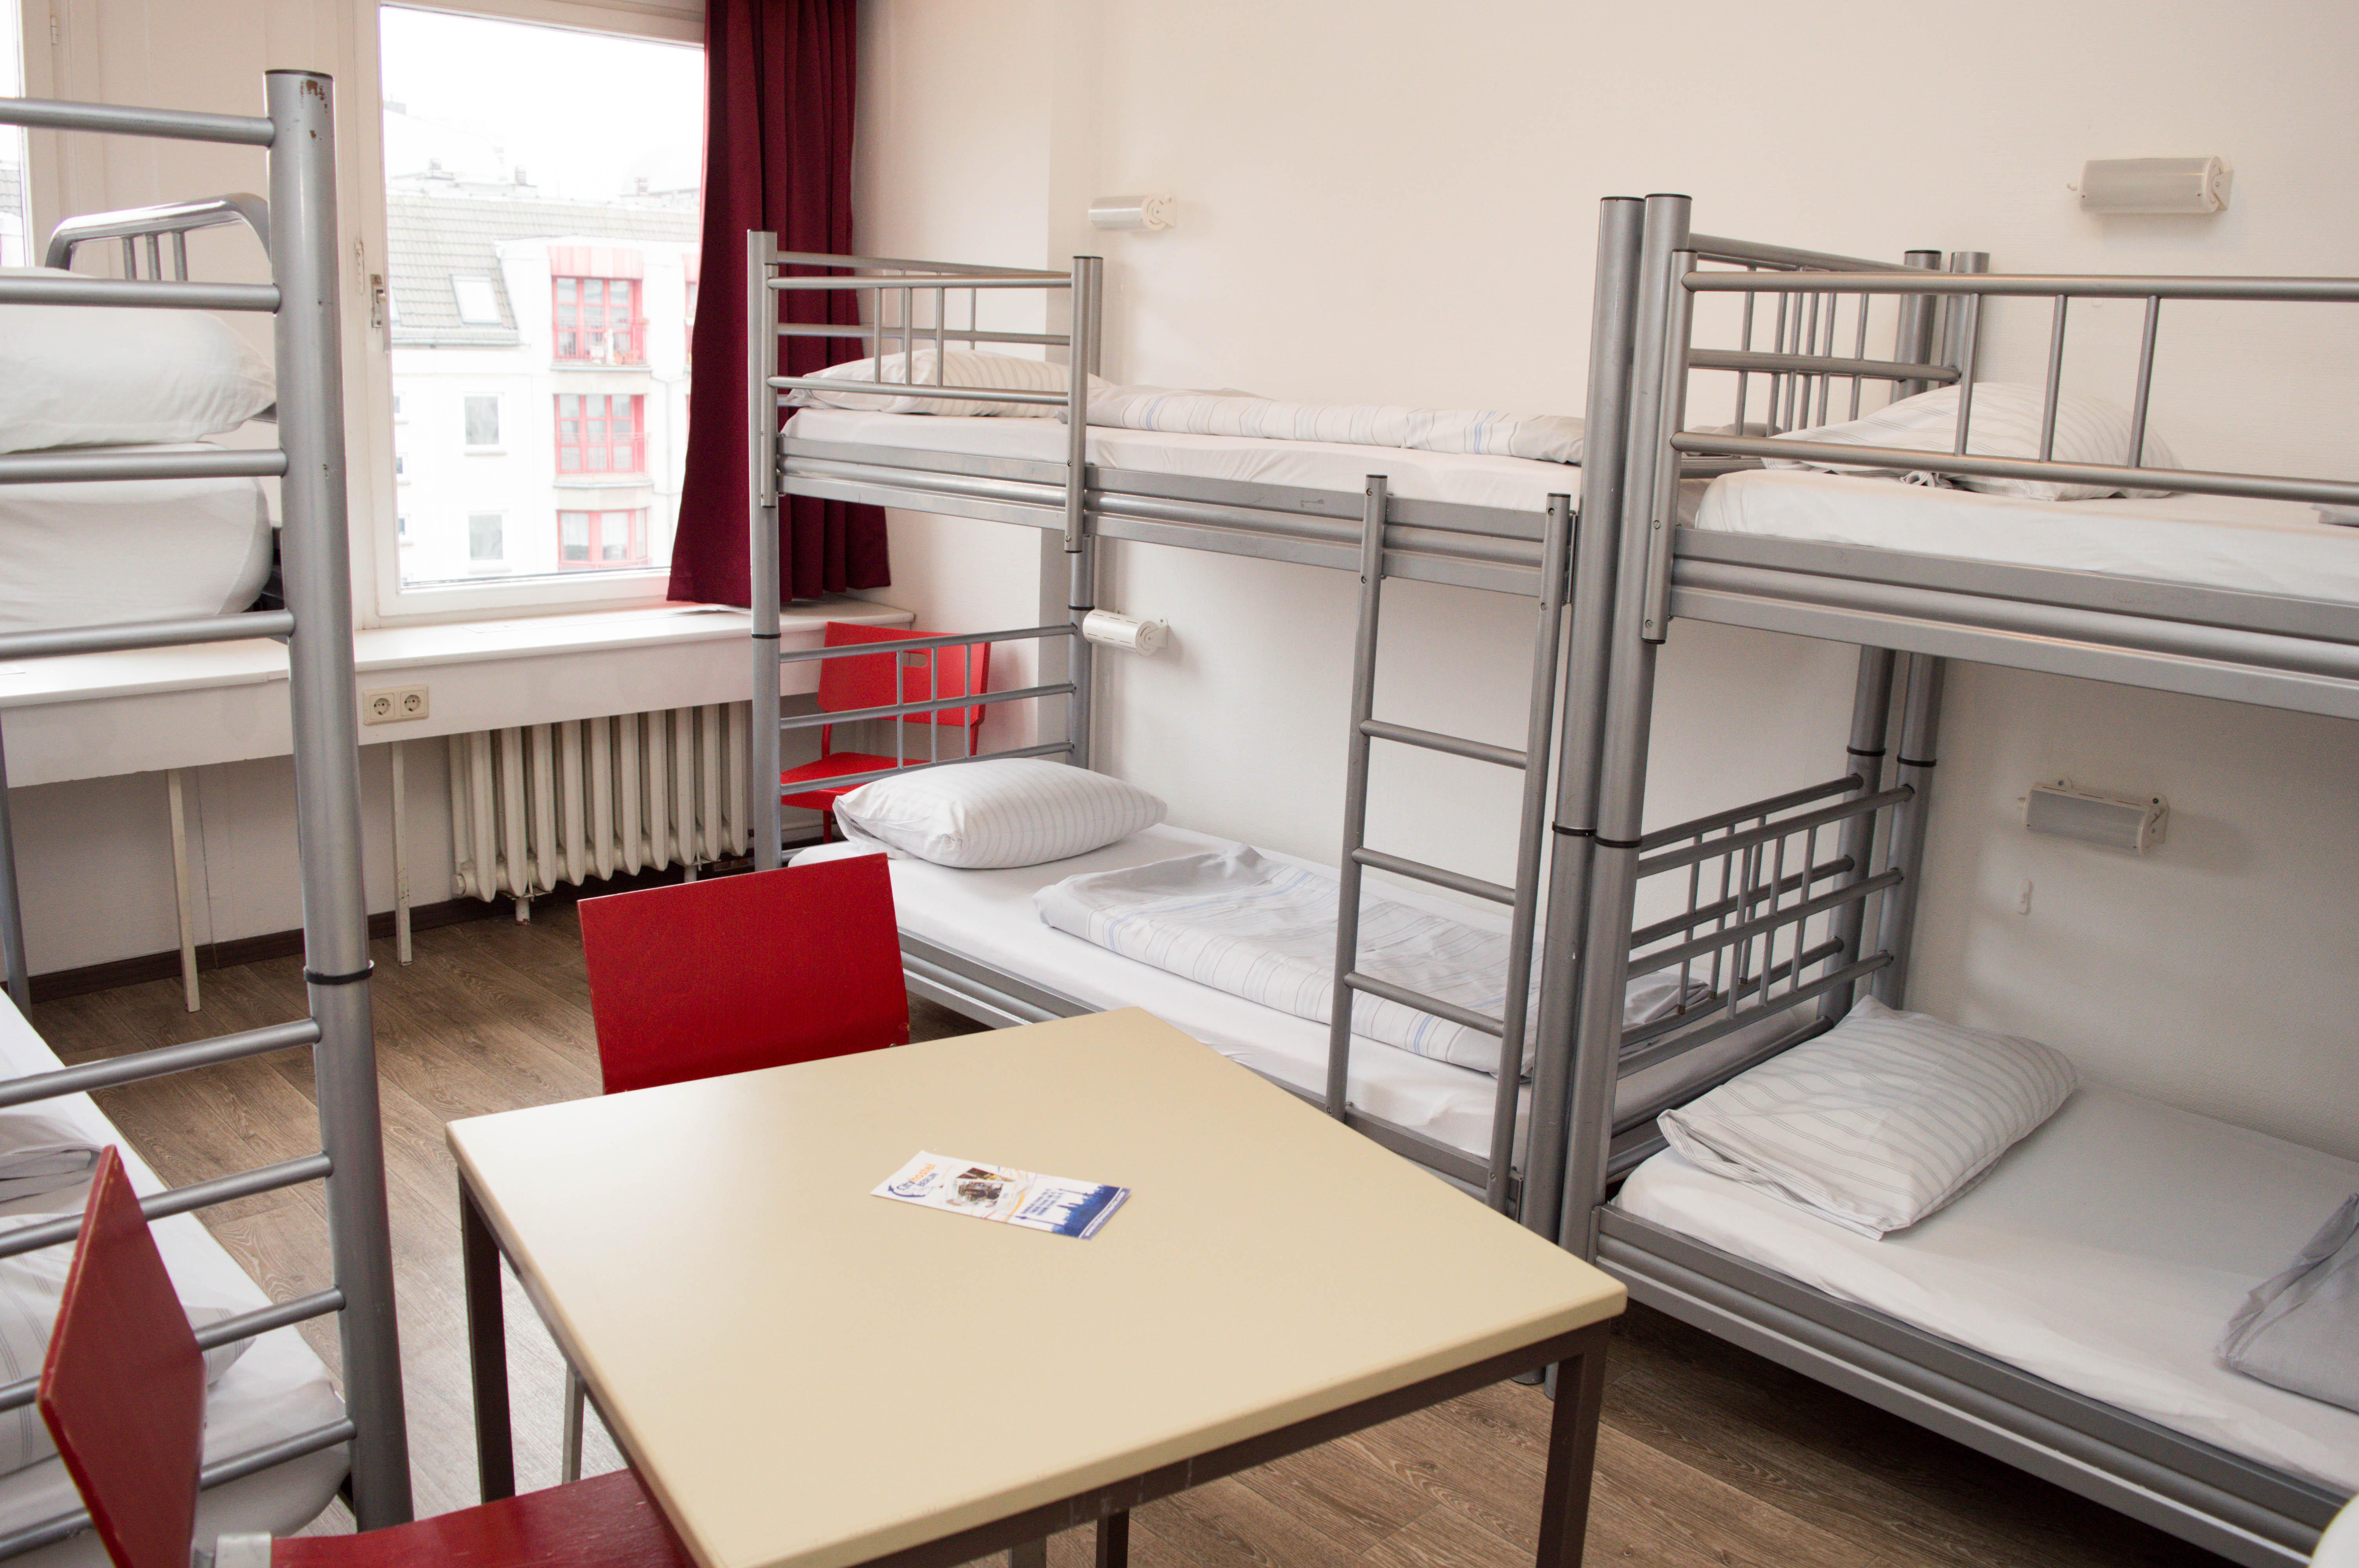 City Hostel Berlin